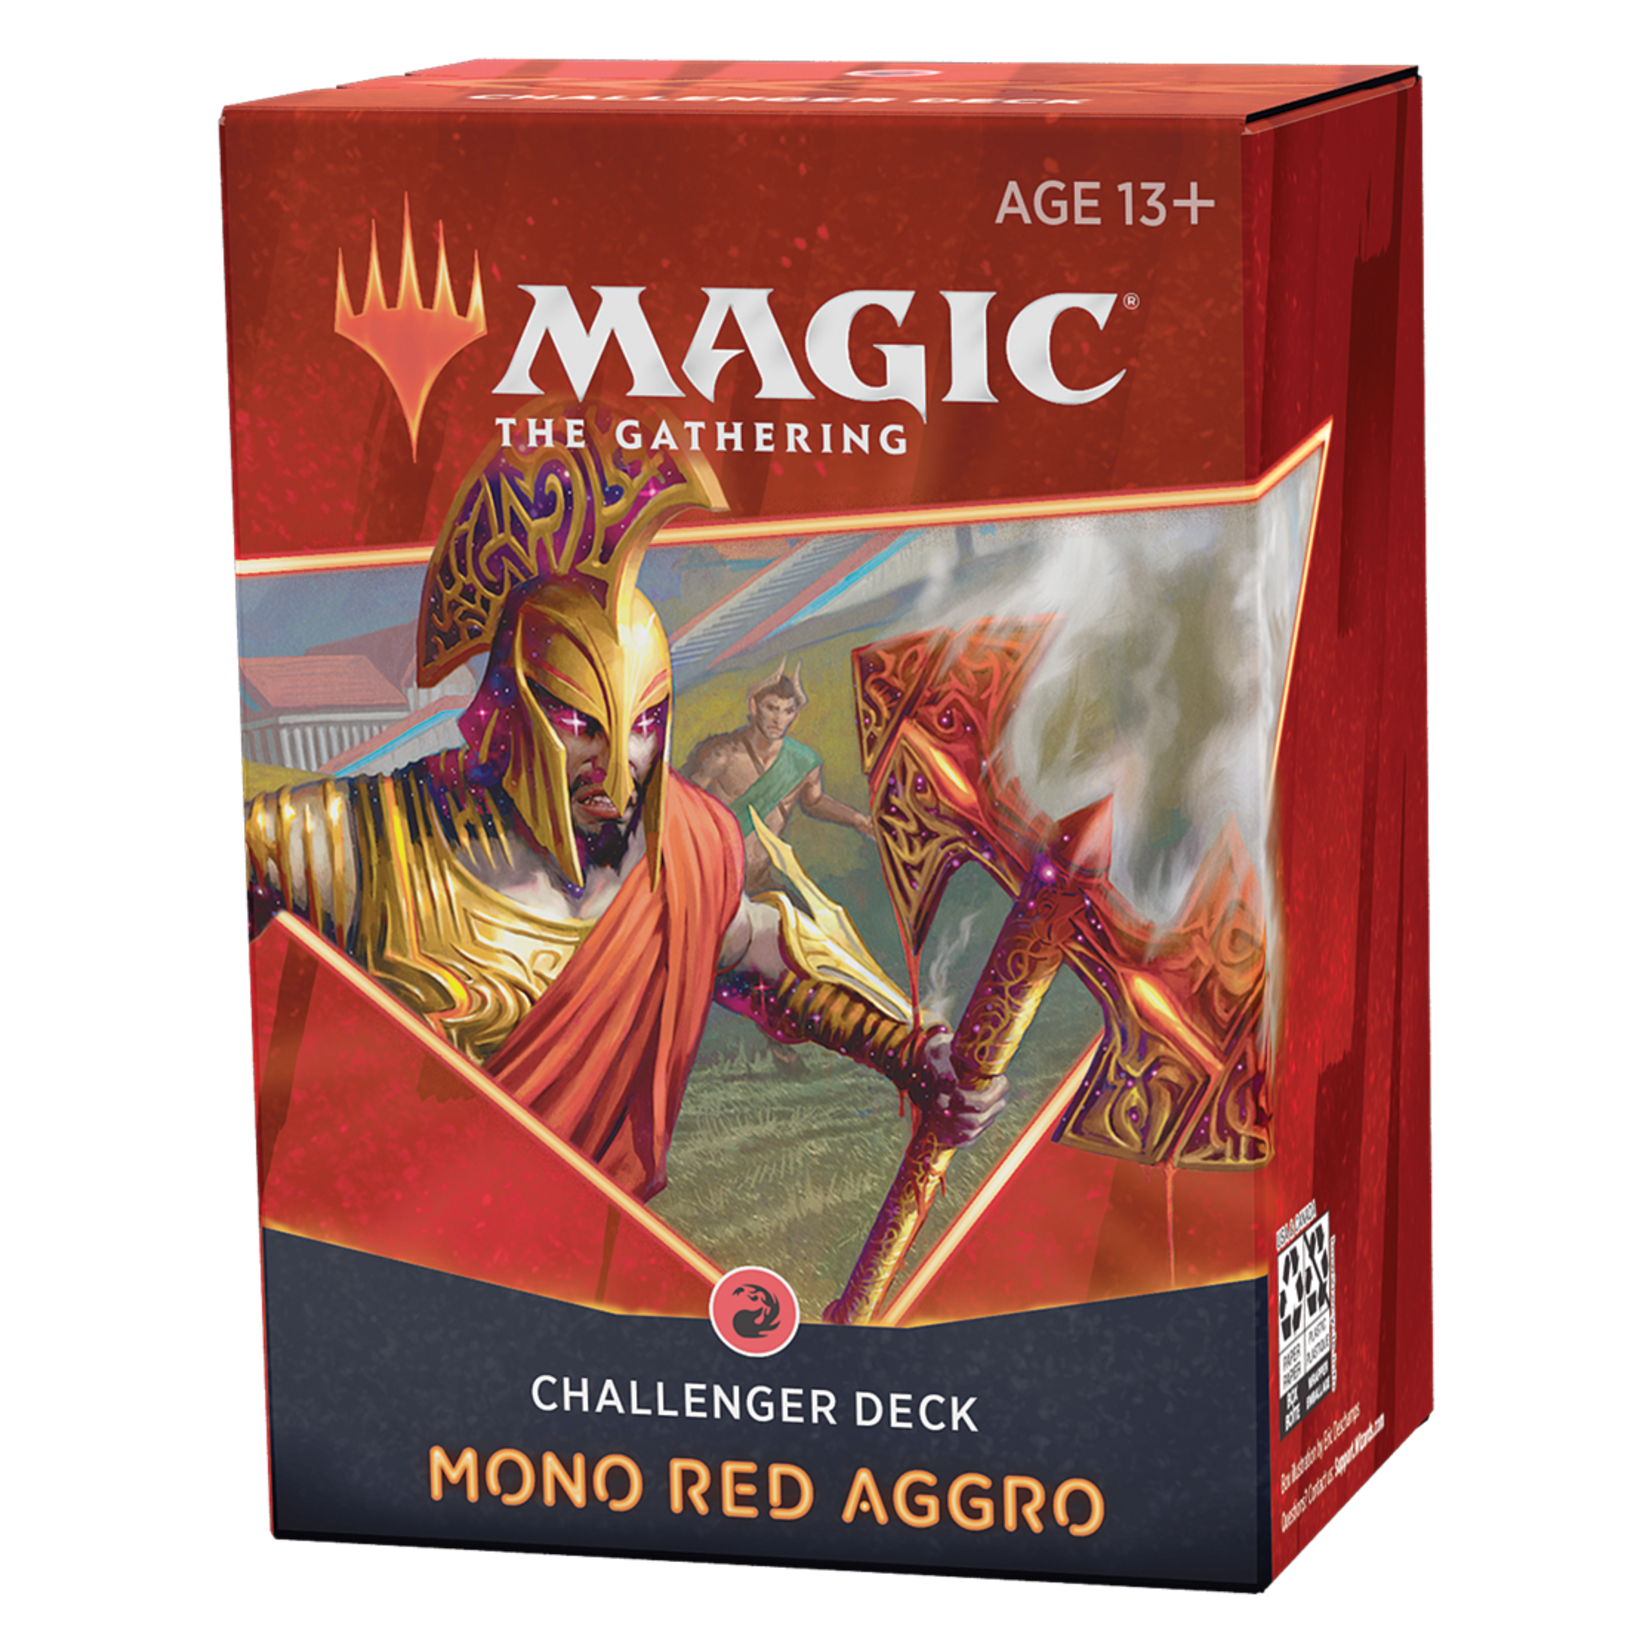 Magic: The Gathering Magic: The Gathering - Challenger Decks 2021 - Mono Red Aggro